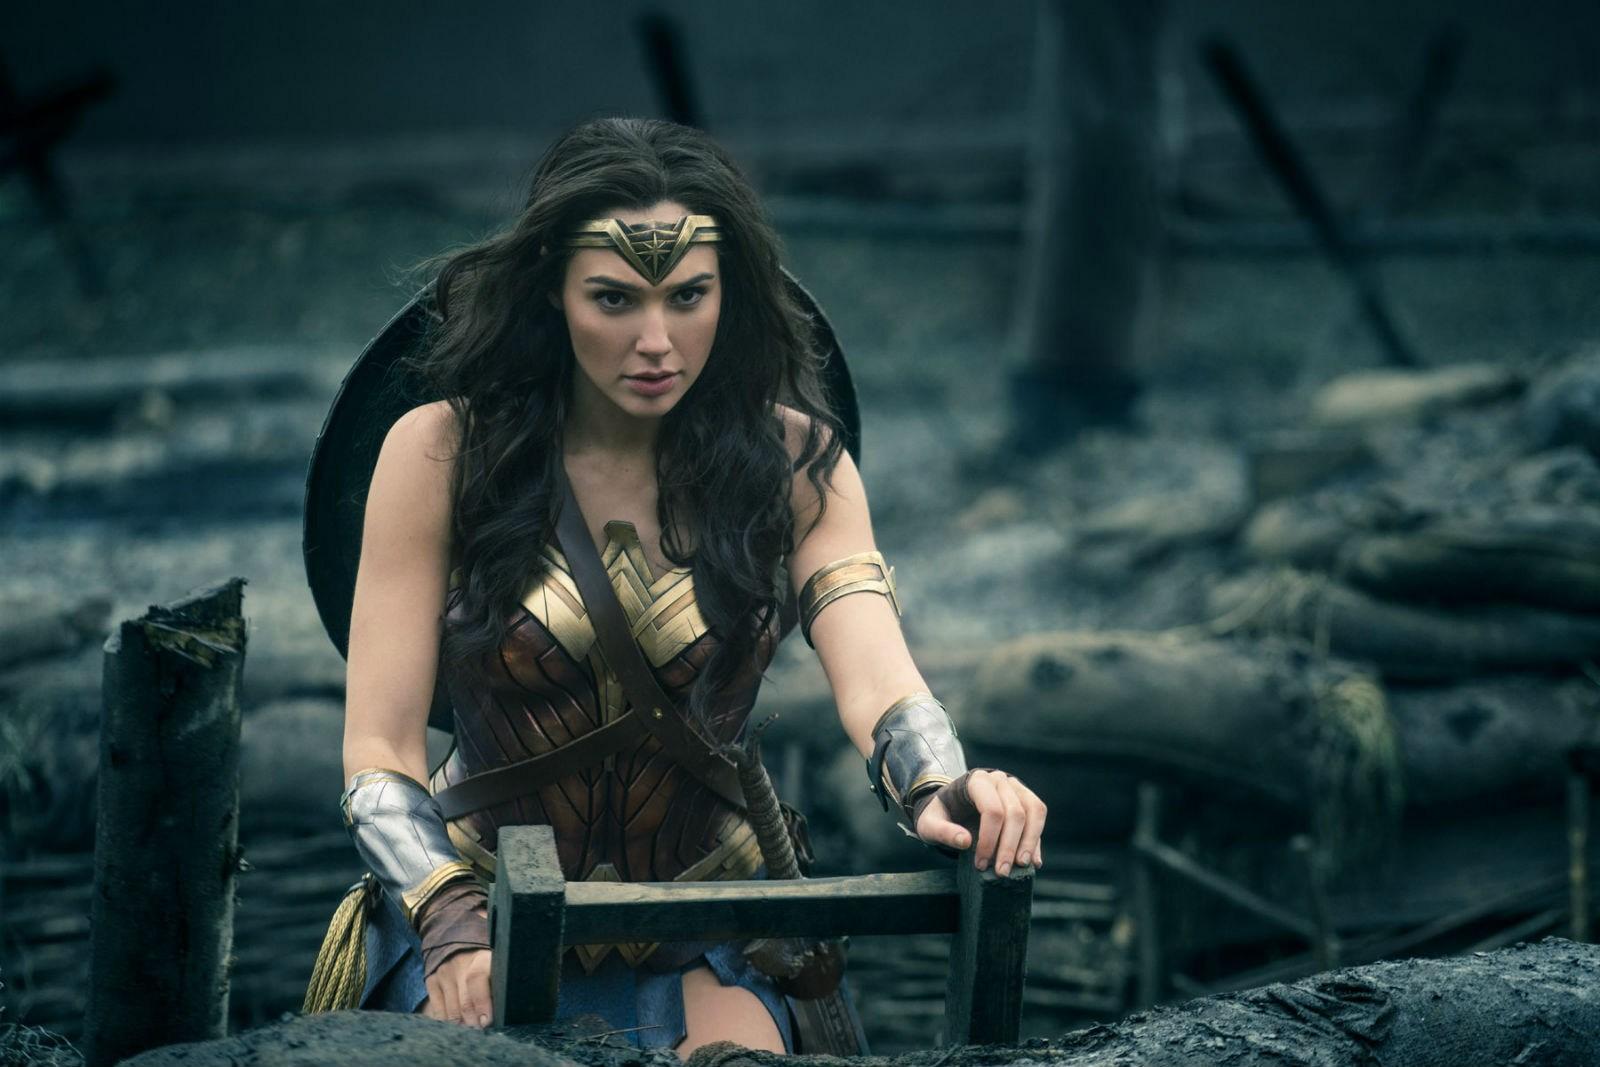 Wonder Woman 2'nin Gösterim Tarihi Belli Oldu